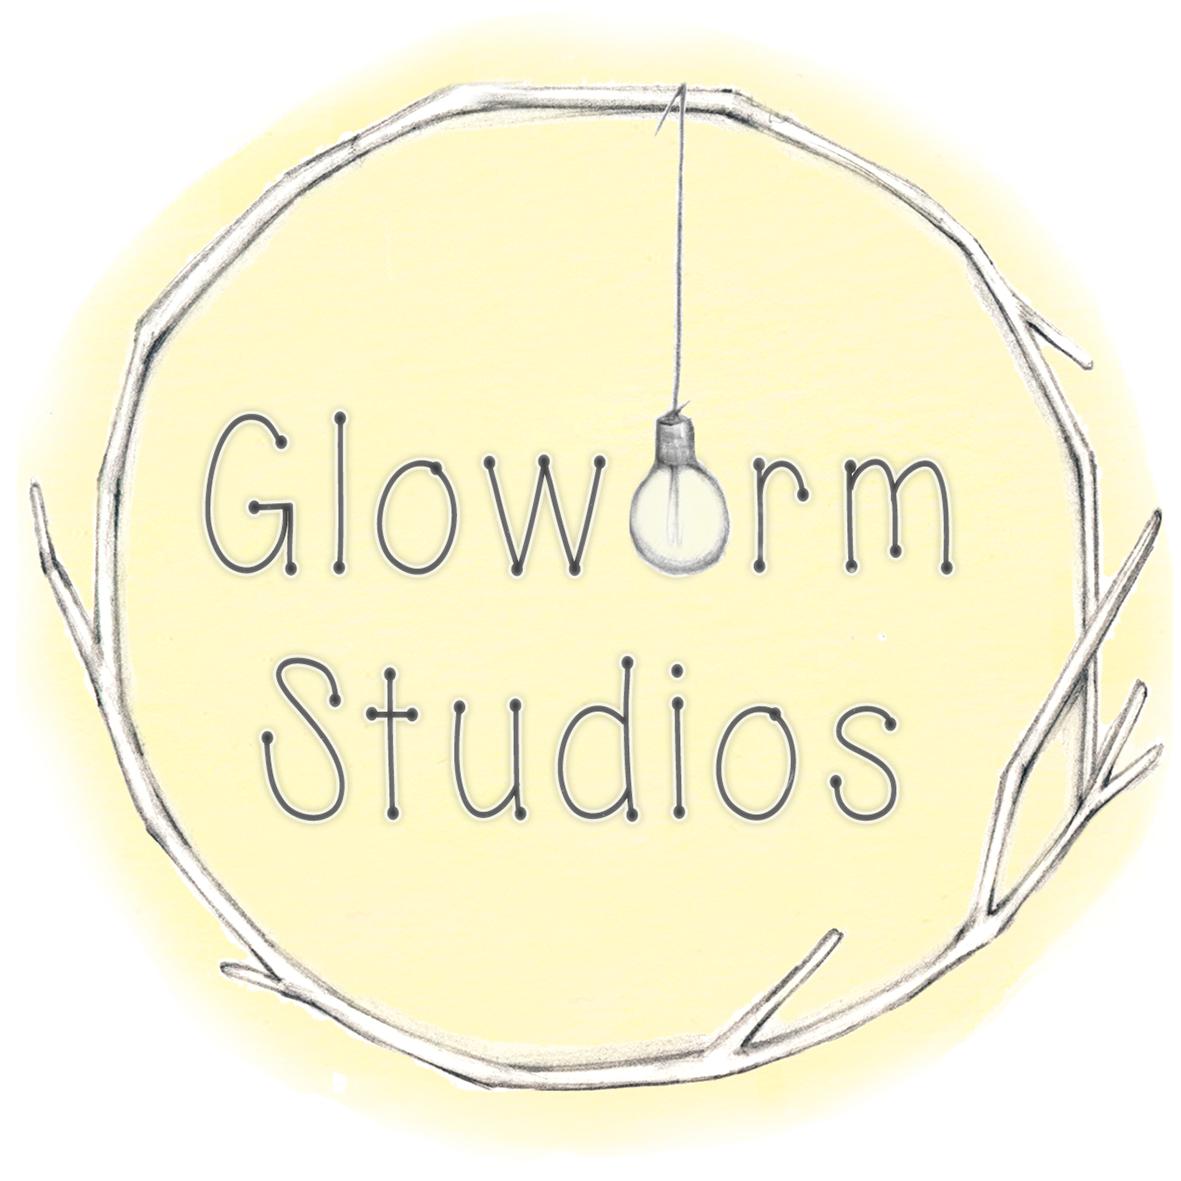 Gloworm Studios